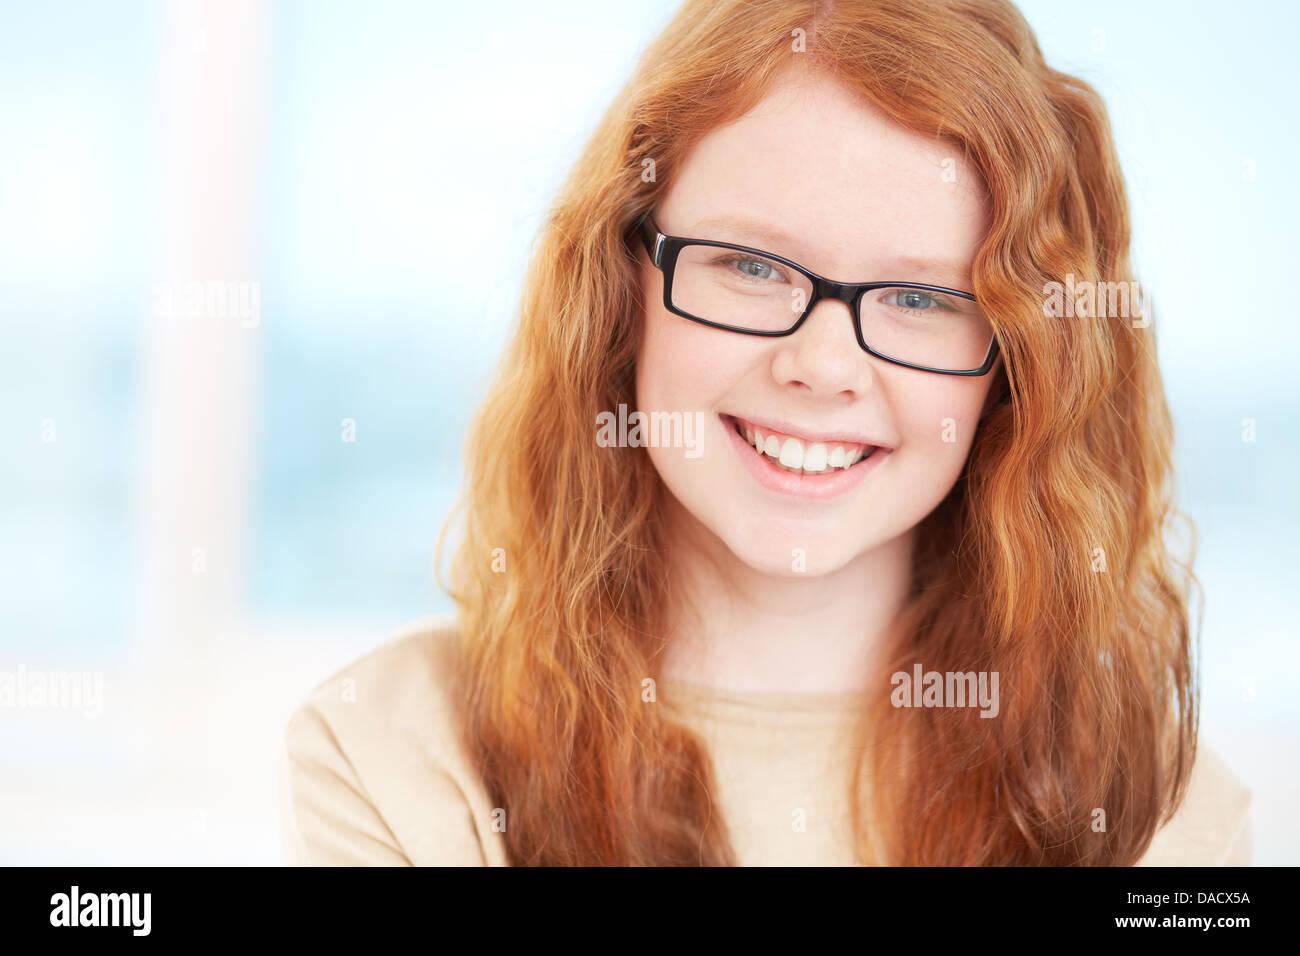 pic-of-redhead-teen-suchen